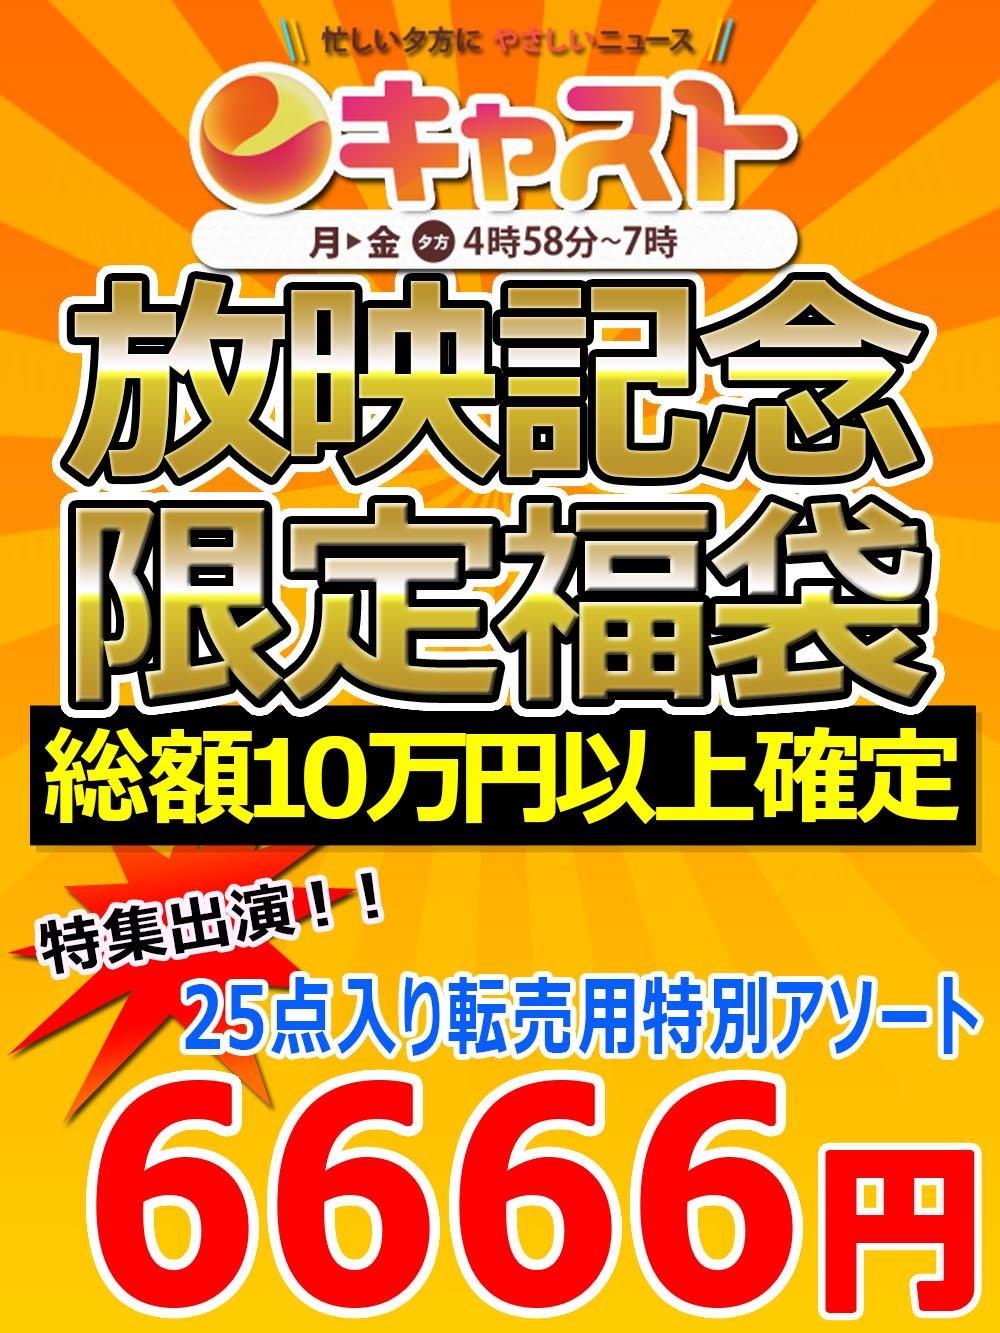 【CAST出演!】特別記念福袋!総額10万円確定転売用アソート【25点】6666円